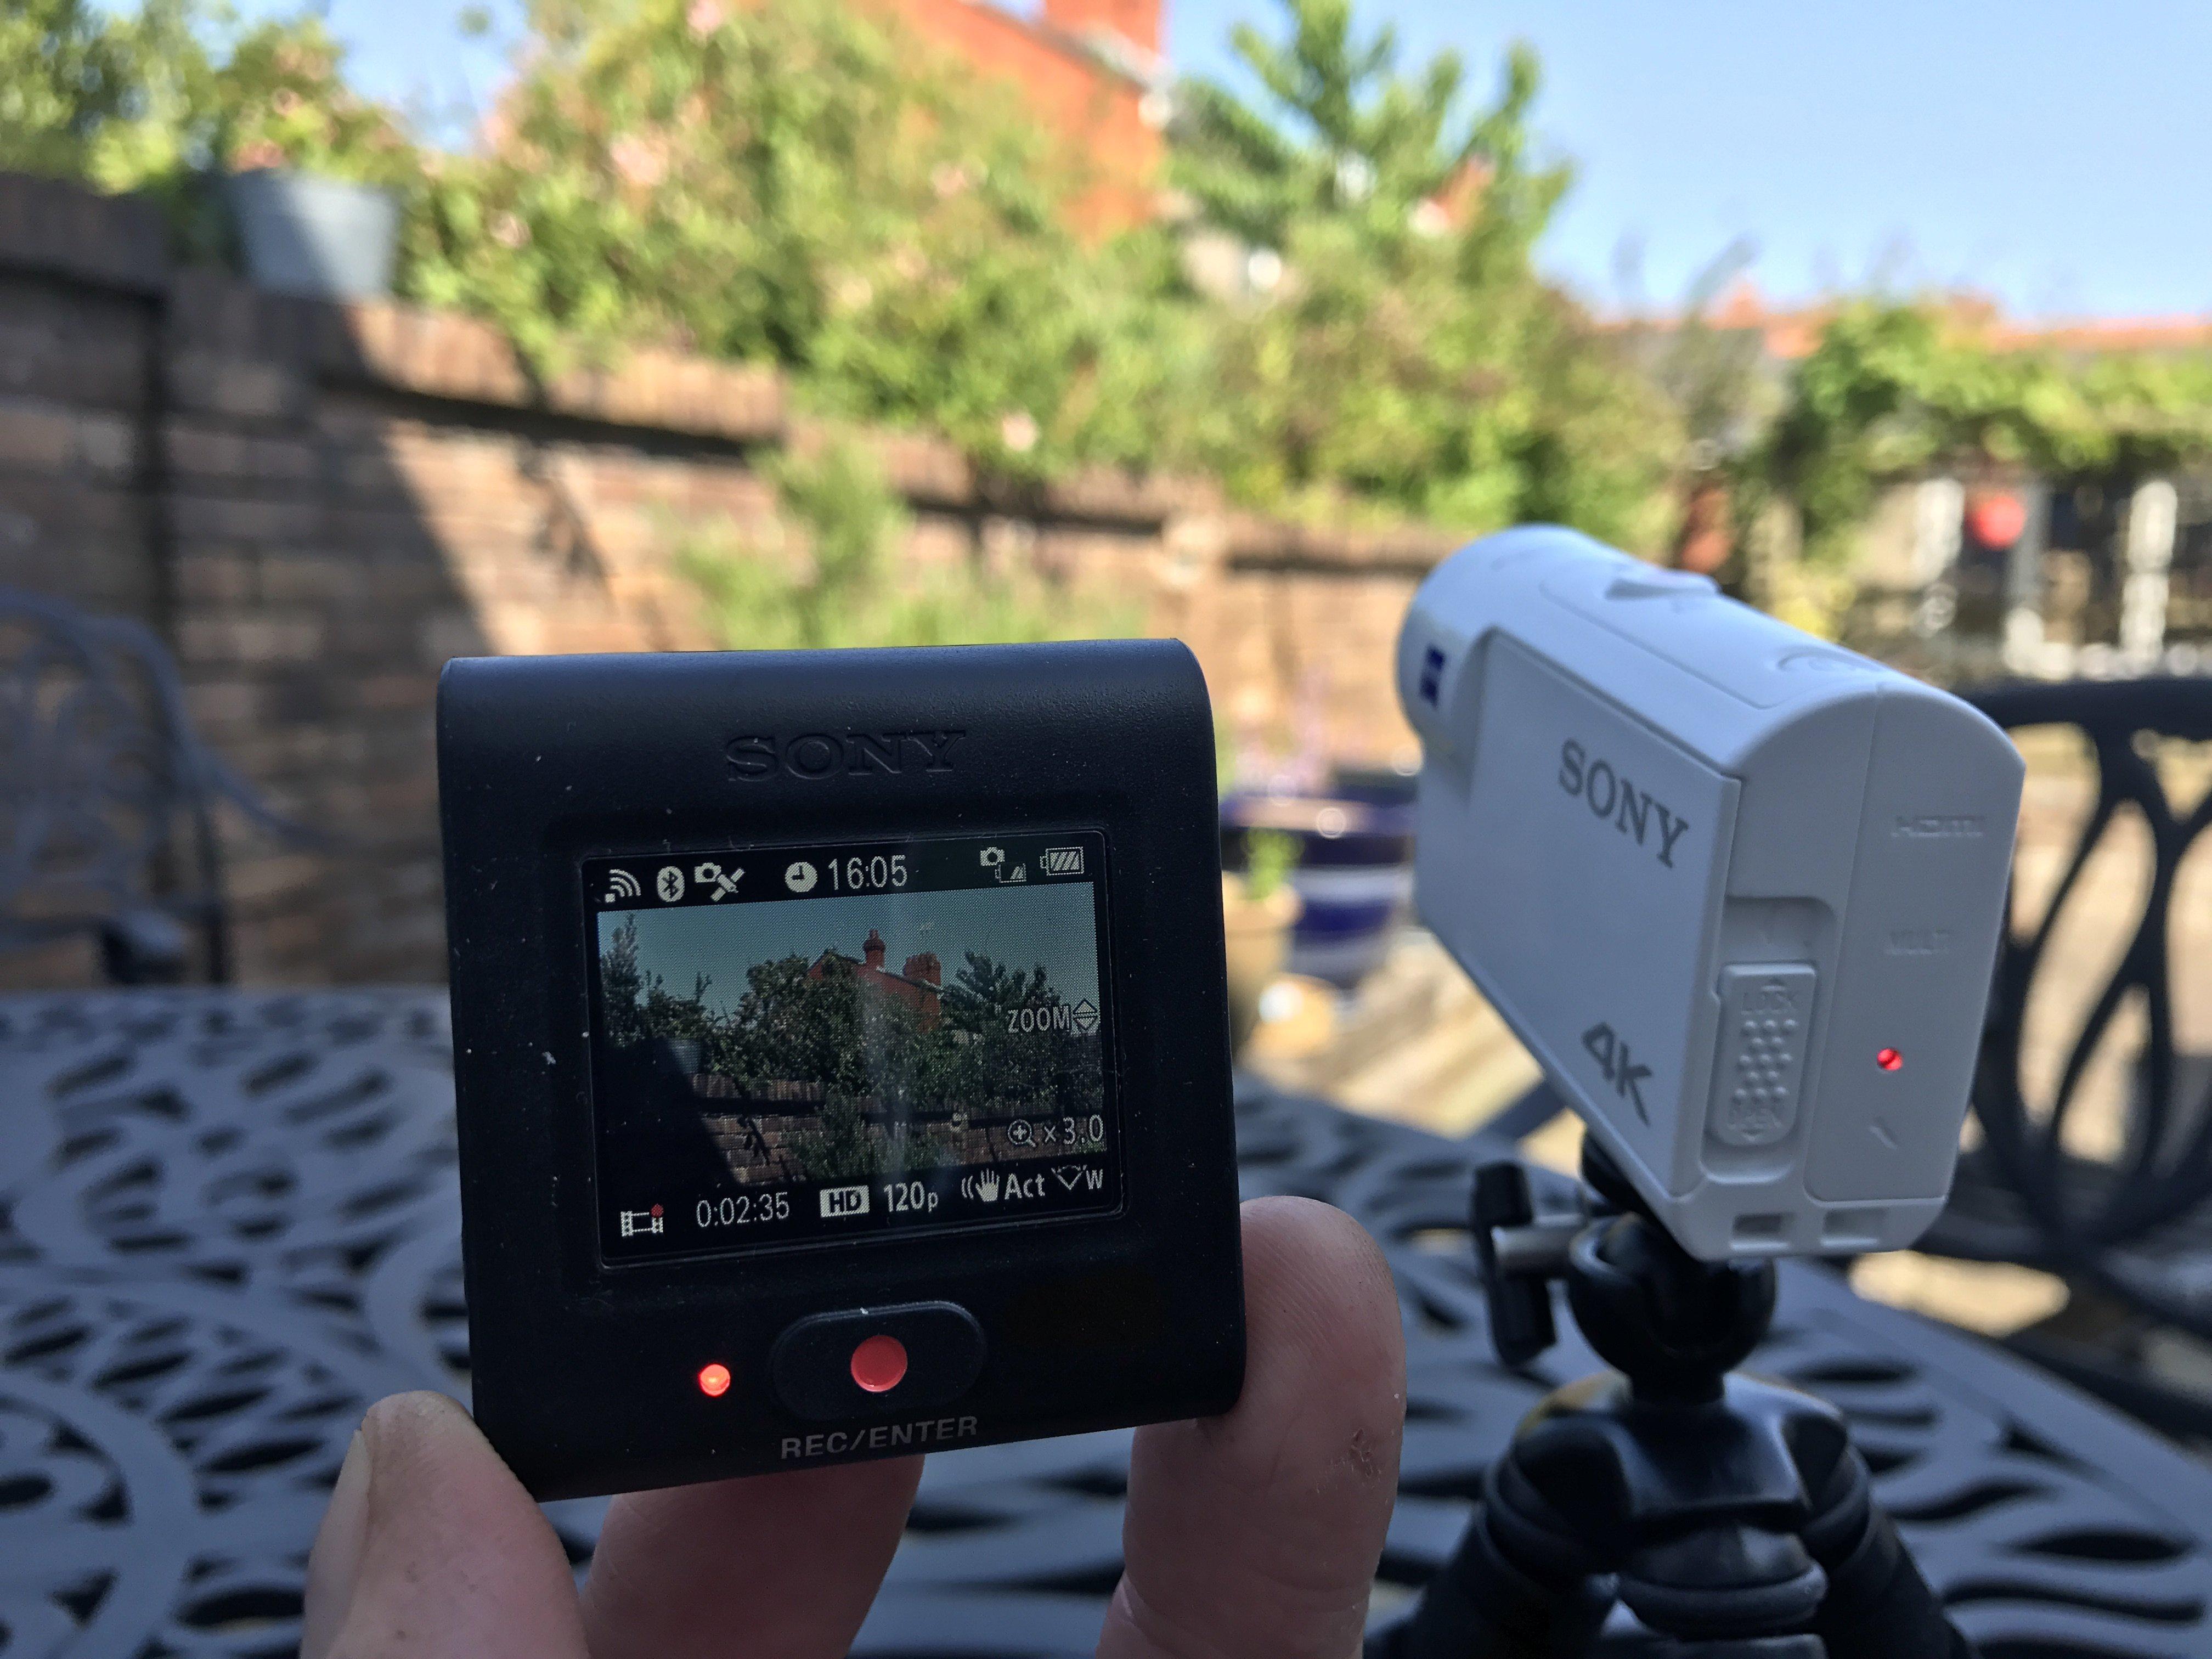 REVIEWED: Sony FDR-X3000R Handycam - Travgear.com